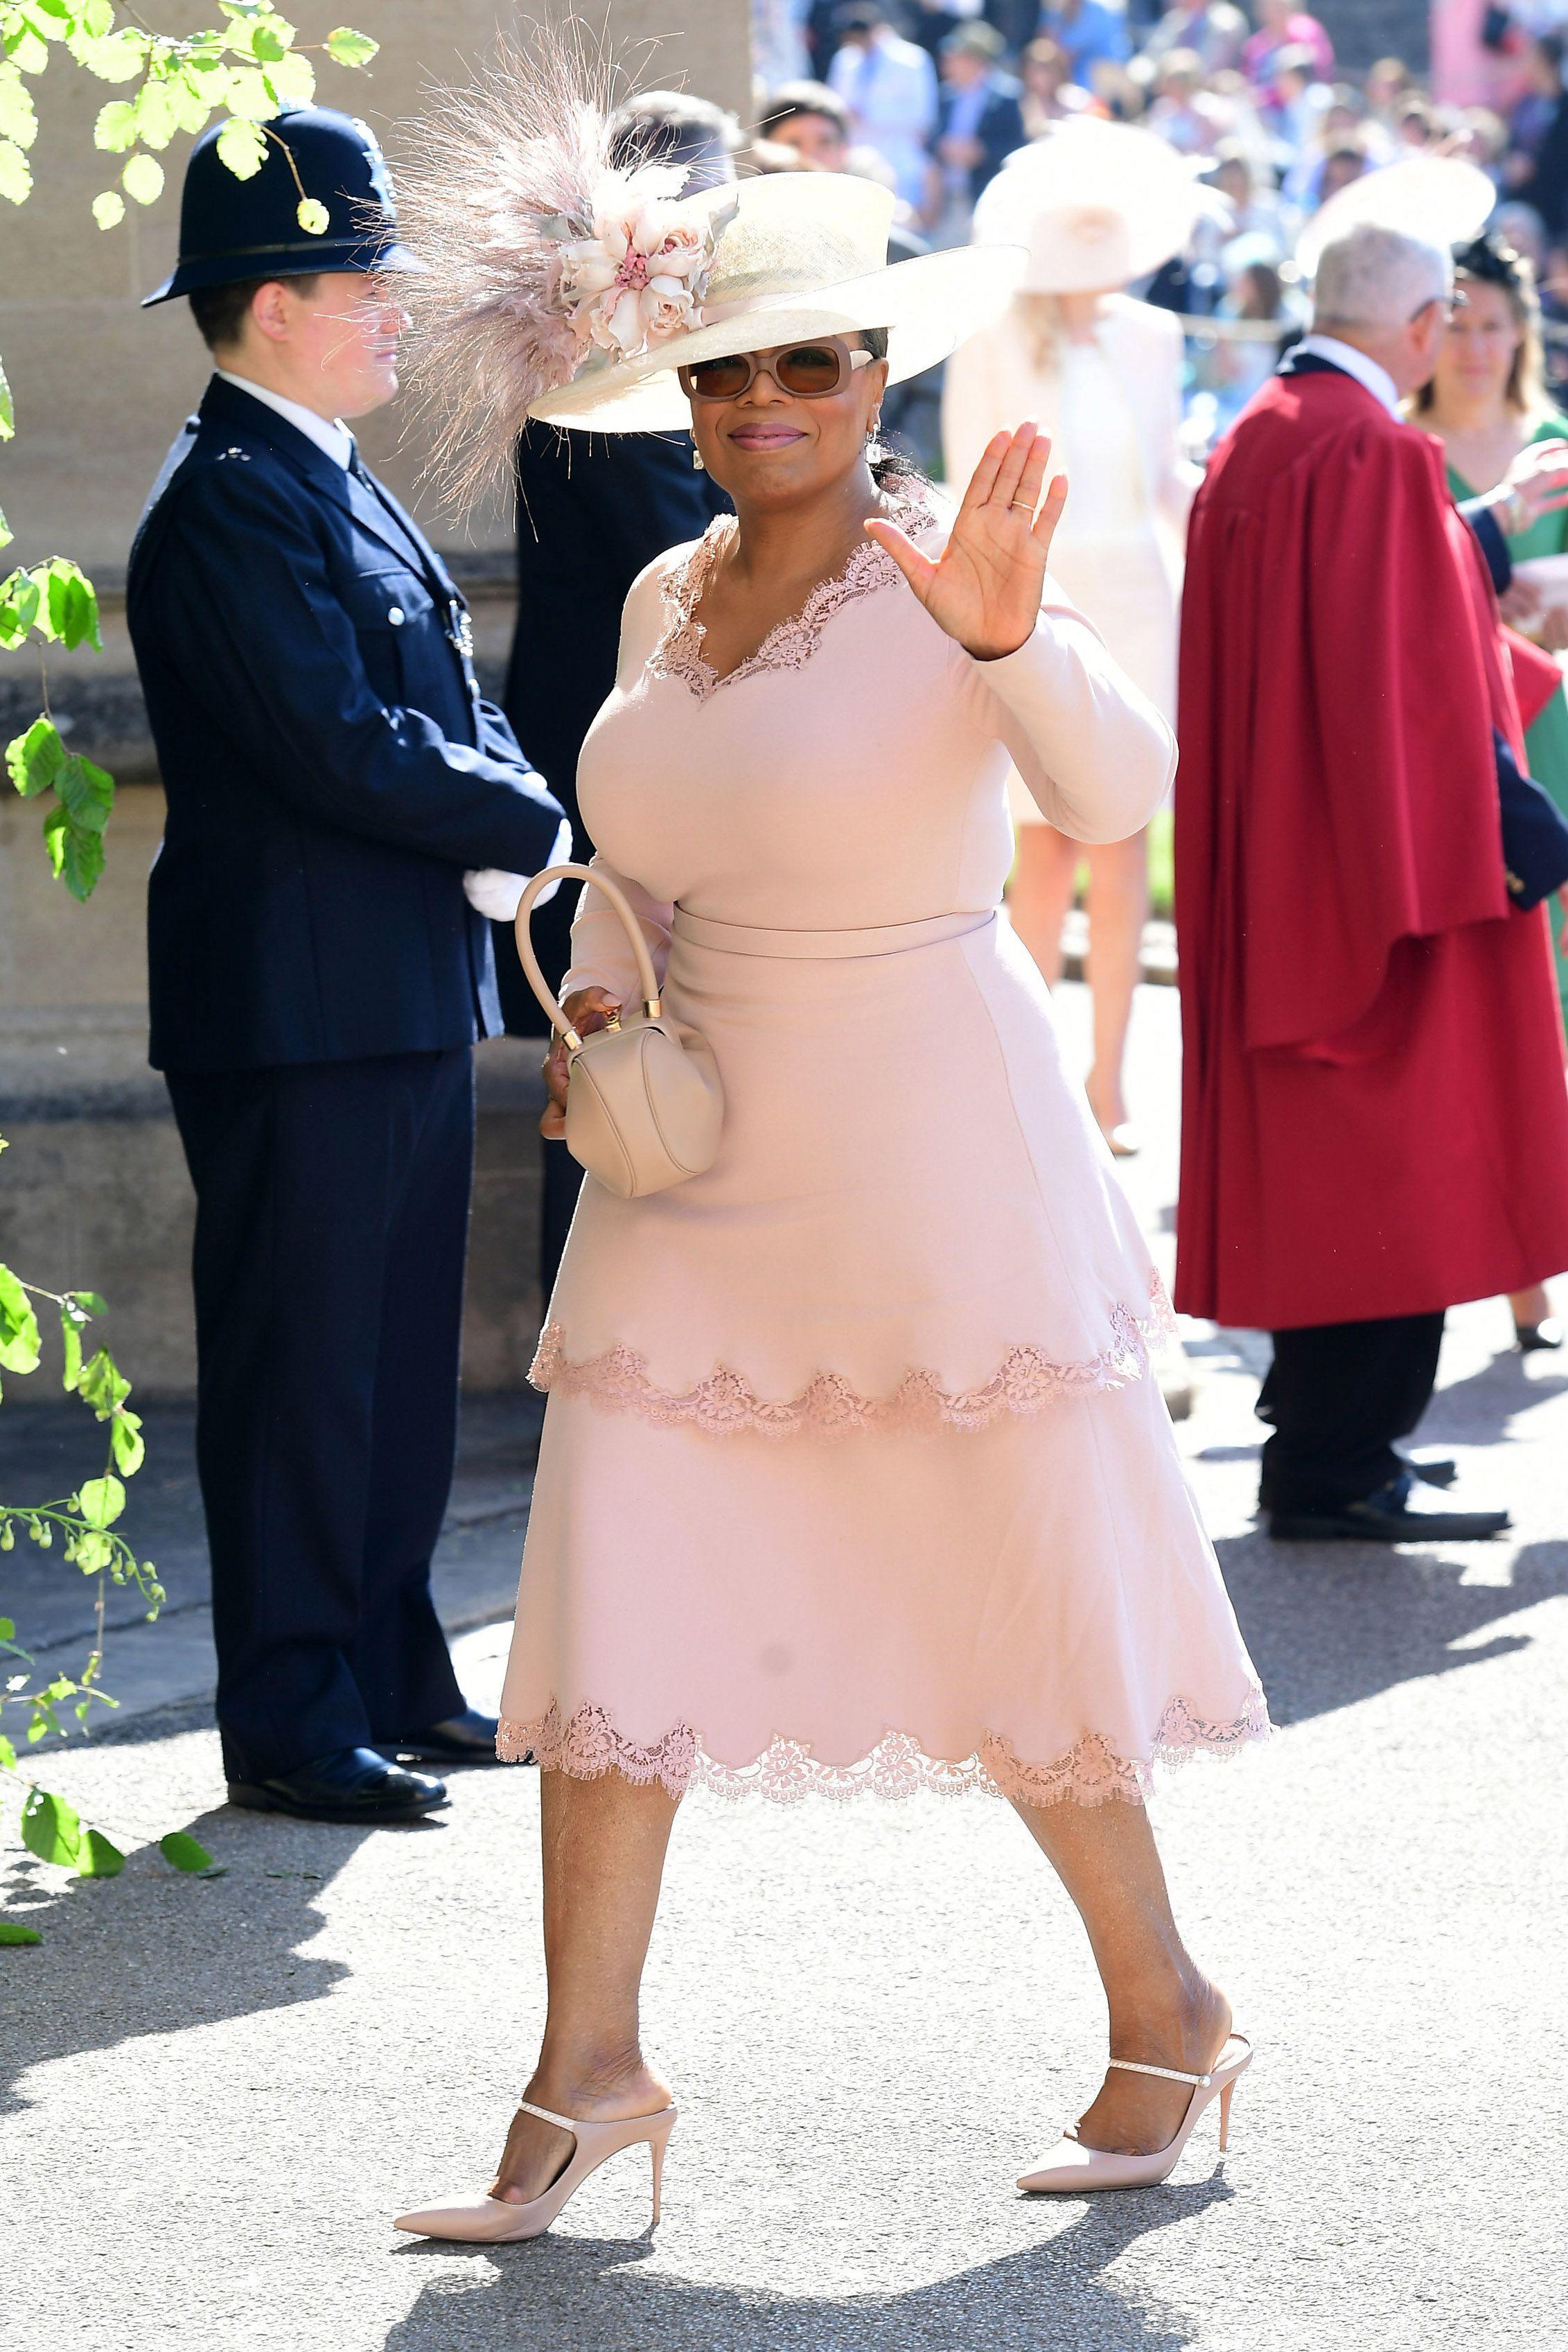 Oprah Wears Stella Mccartney Dress To Royal Wedding Walks And Idris Elba Arrive For Meghan Markle